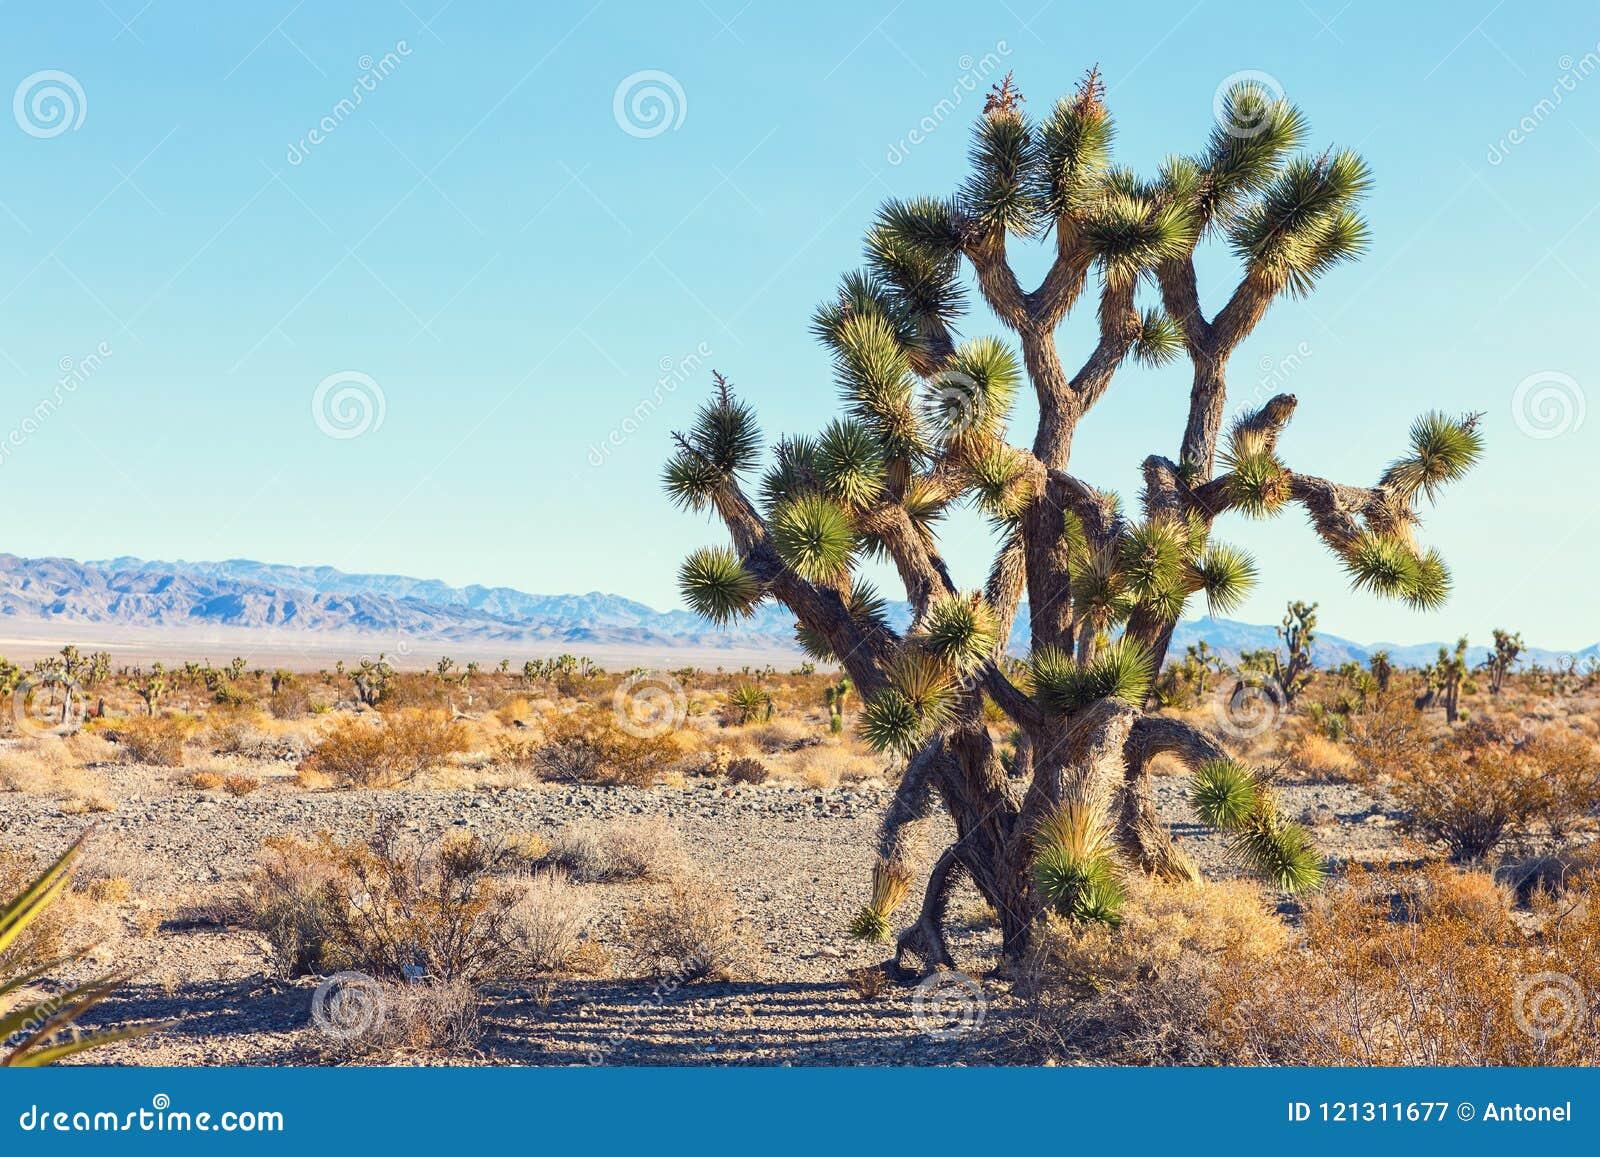 Stora Joshua Tree i mojaven Deserte, Kalifornien, Förenta staterna